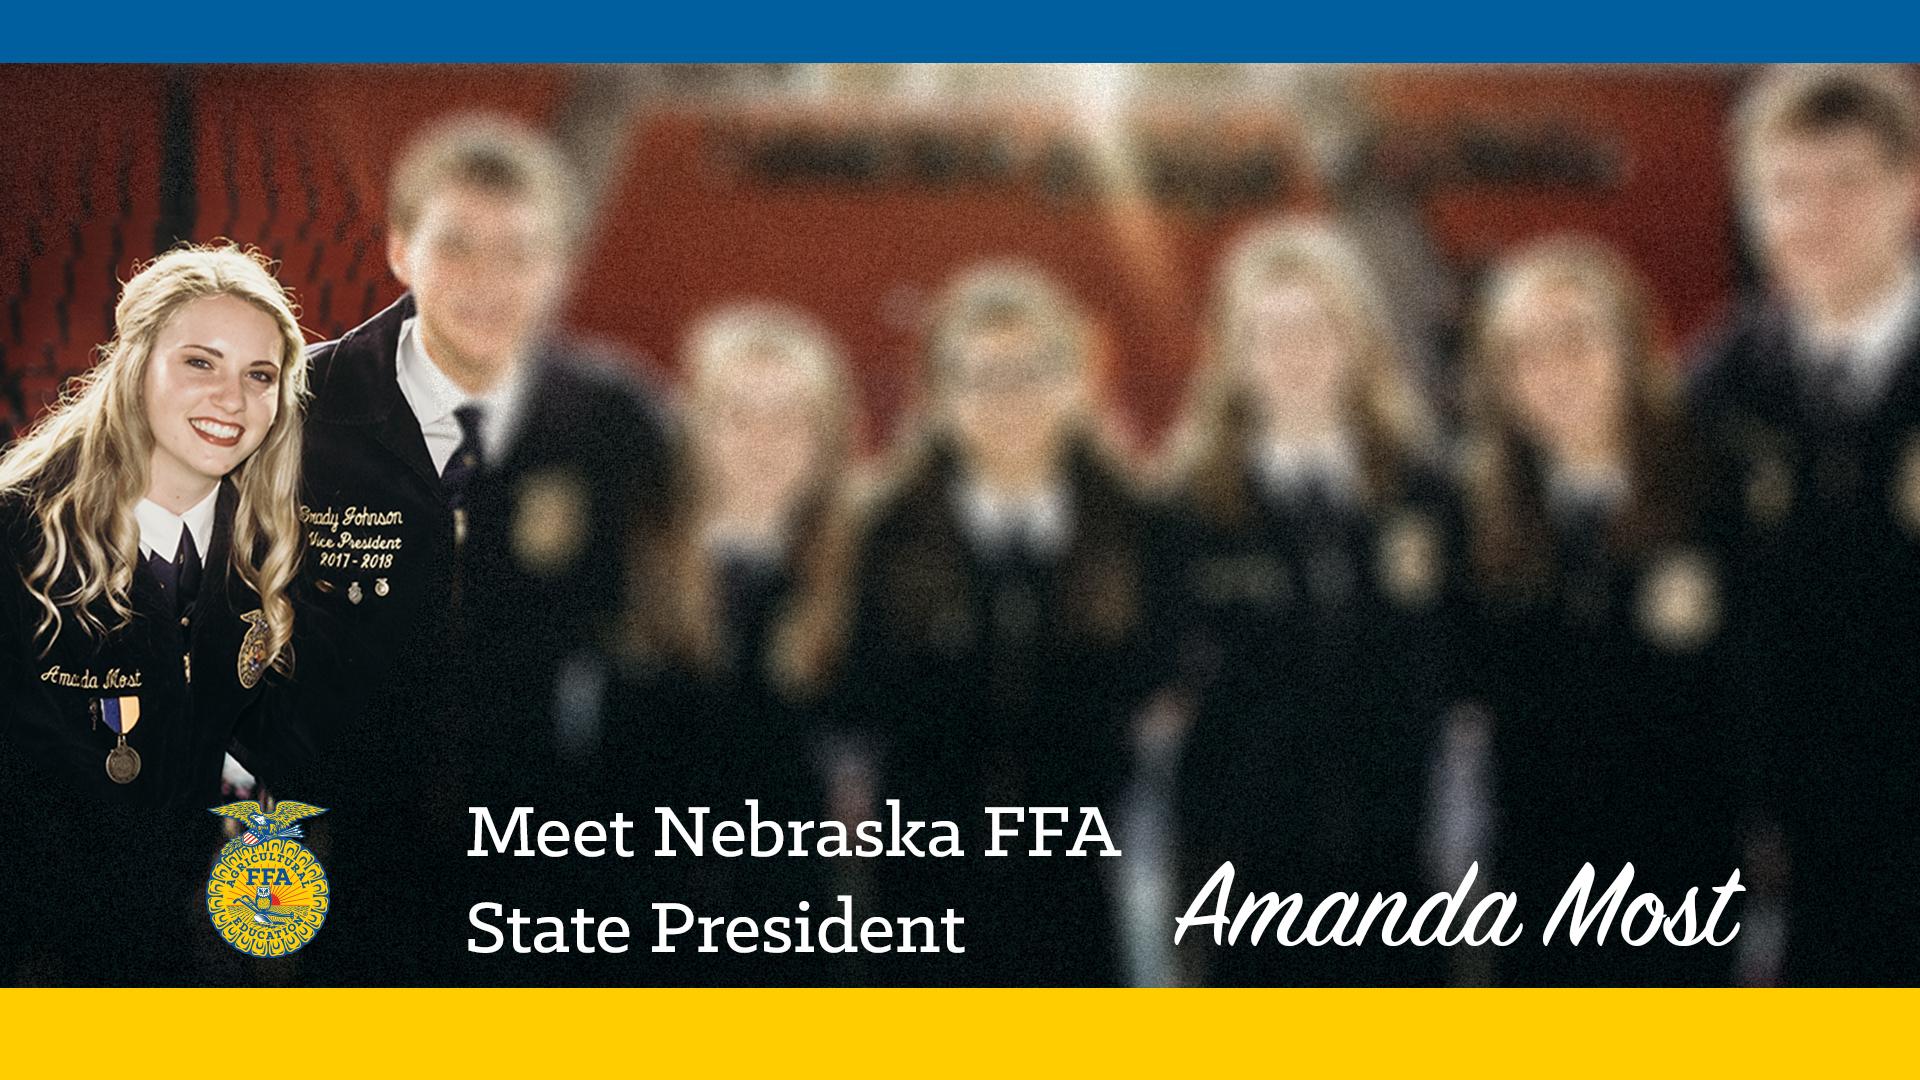 Meet Your 2018-19 Nebraska FFA President: Amanda Most